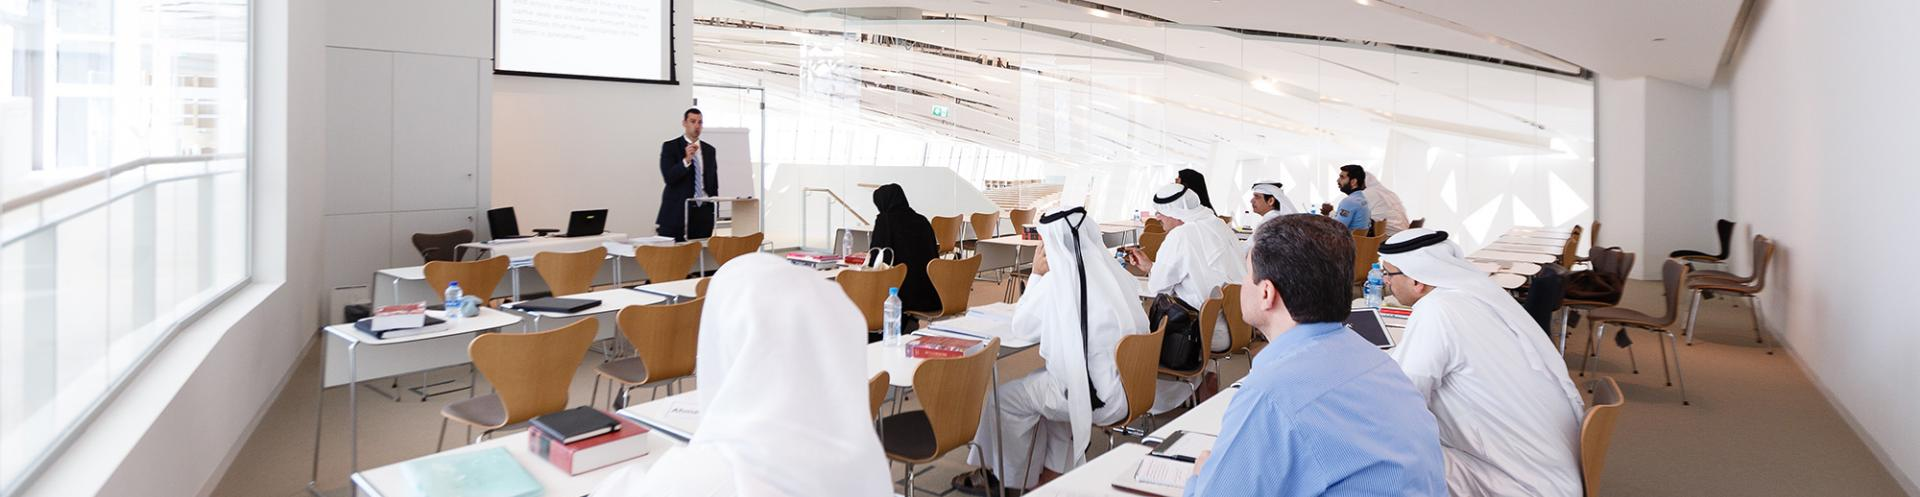 Graduate Studies Information Sessions 2020